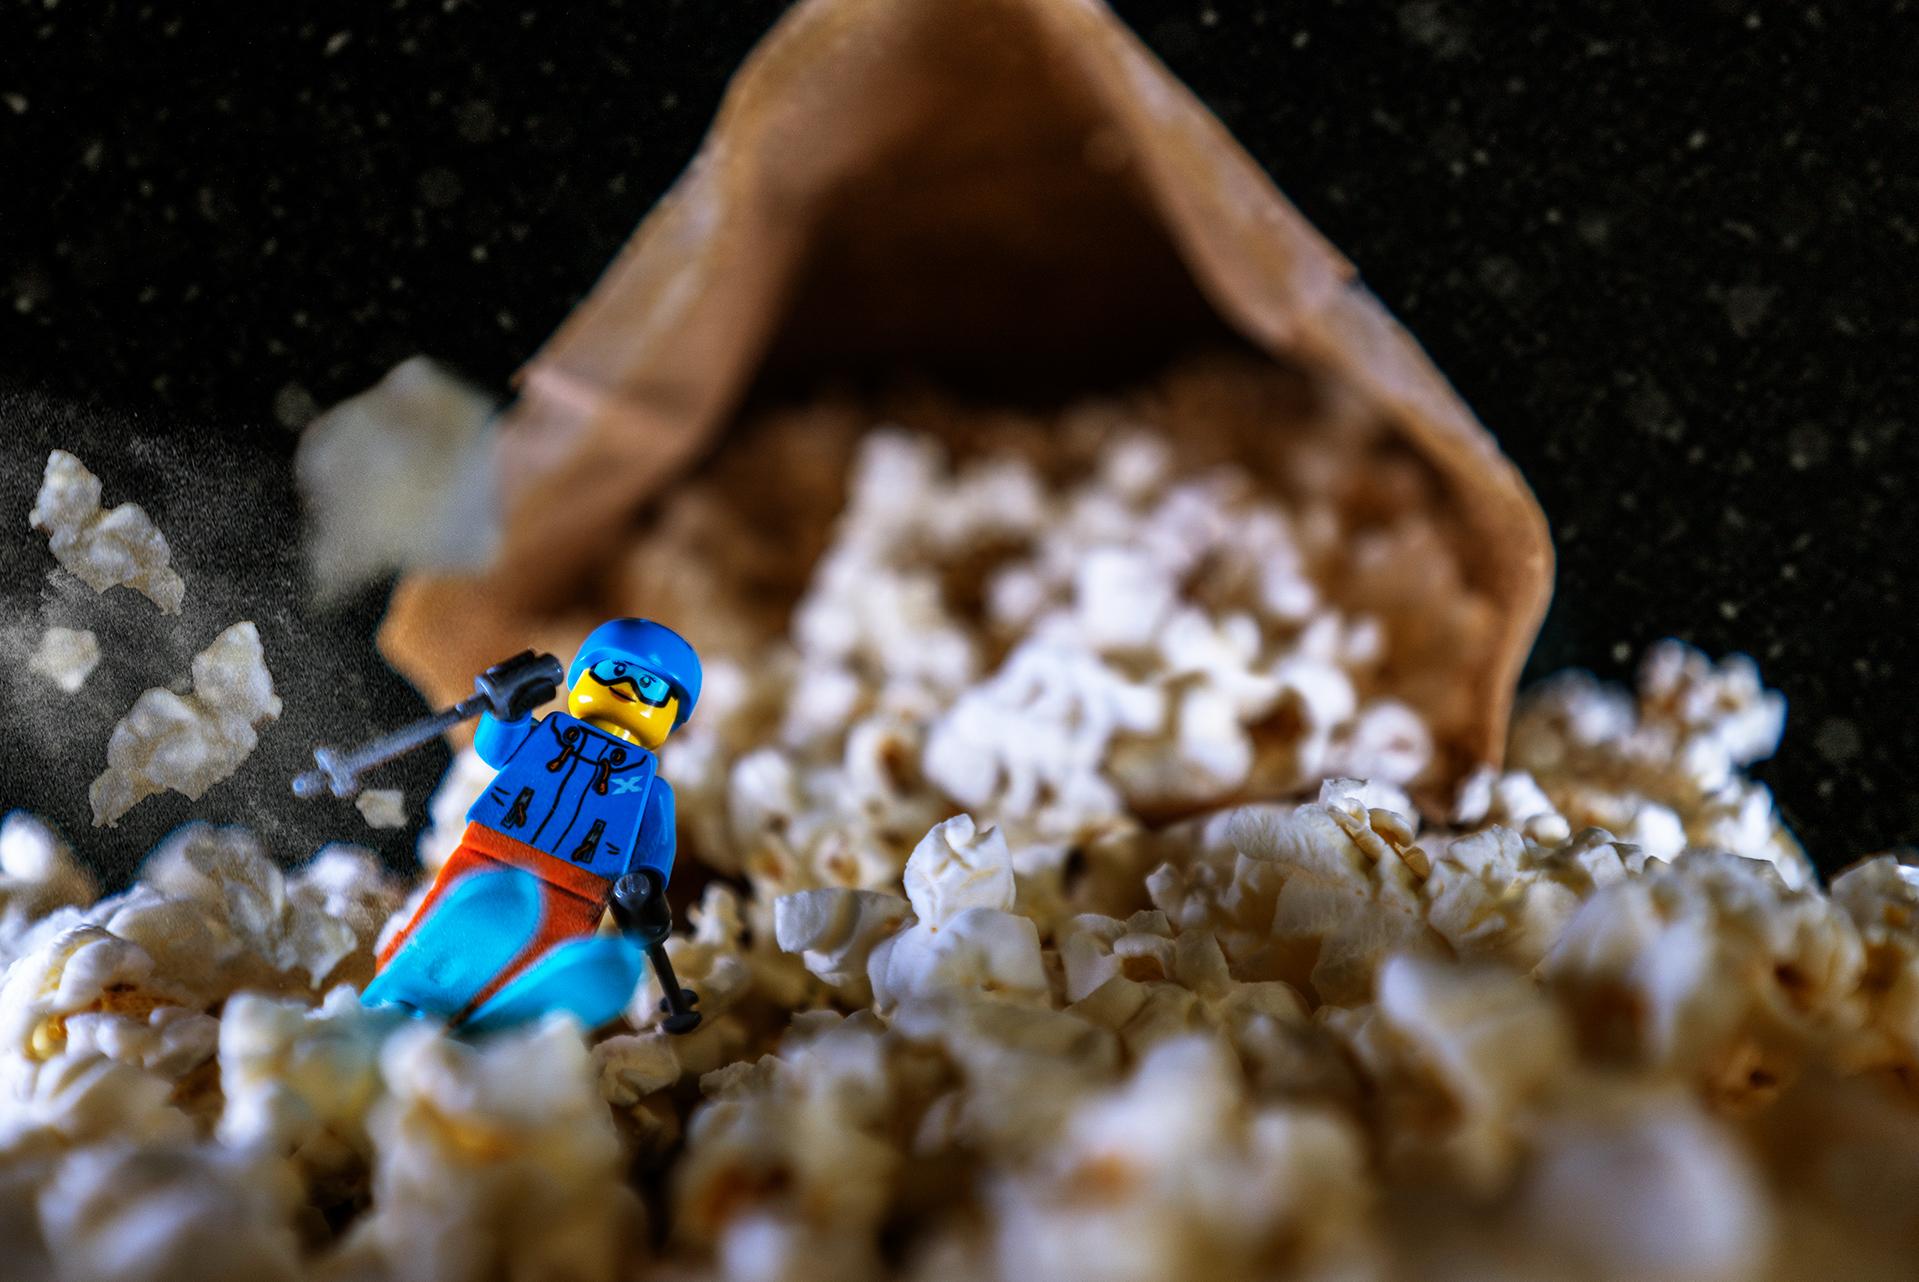 the popcorn skier